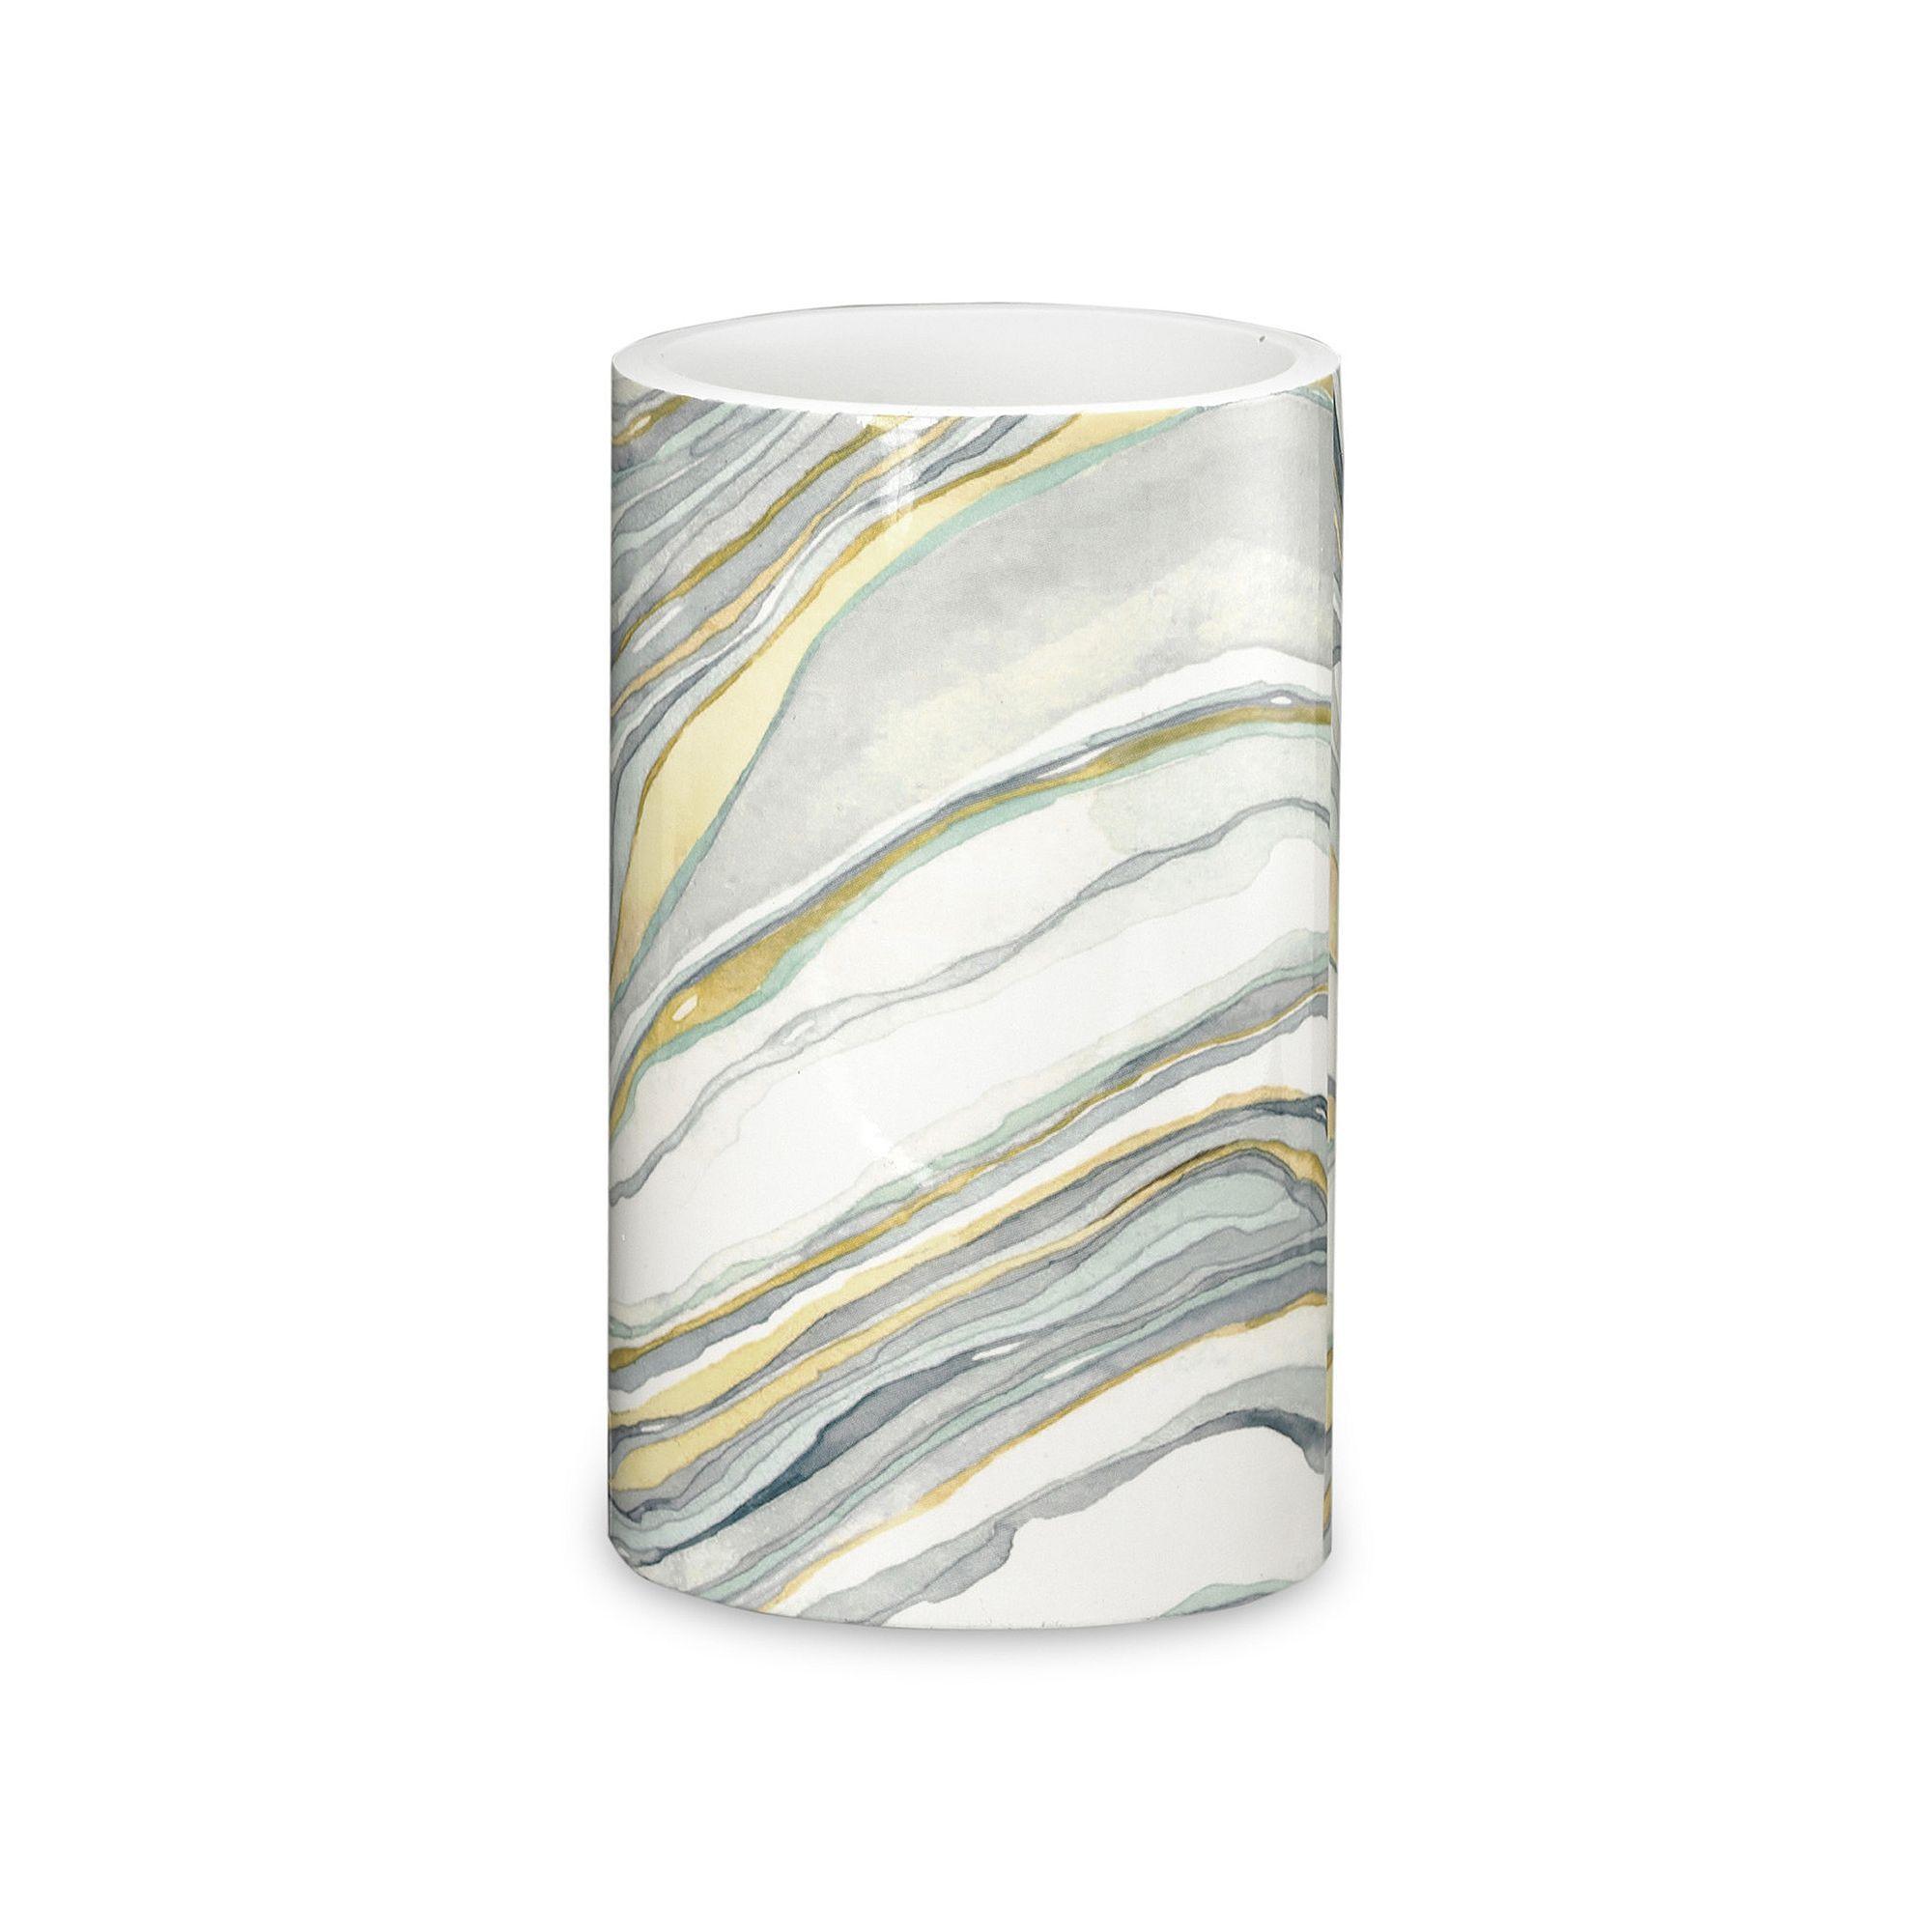 Popular Bath Shell Rummel Sand Stone Tumbler Stone Tumbler